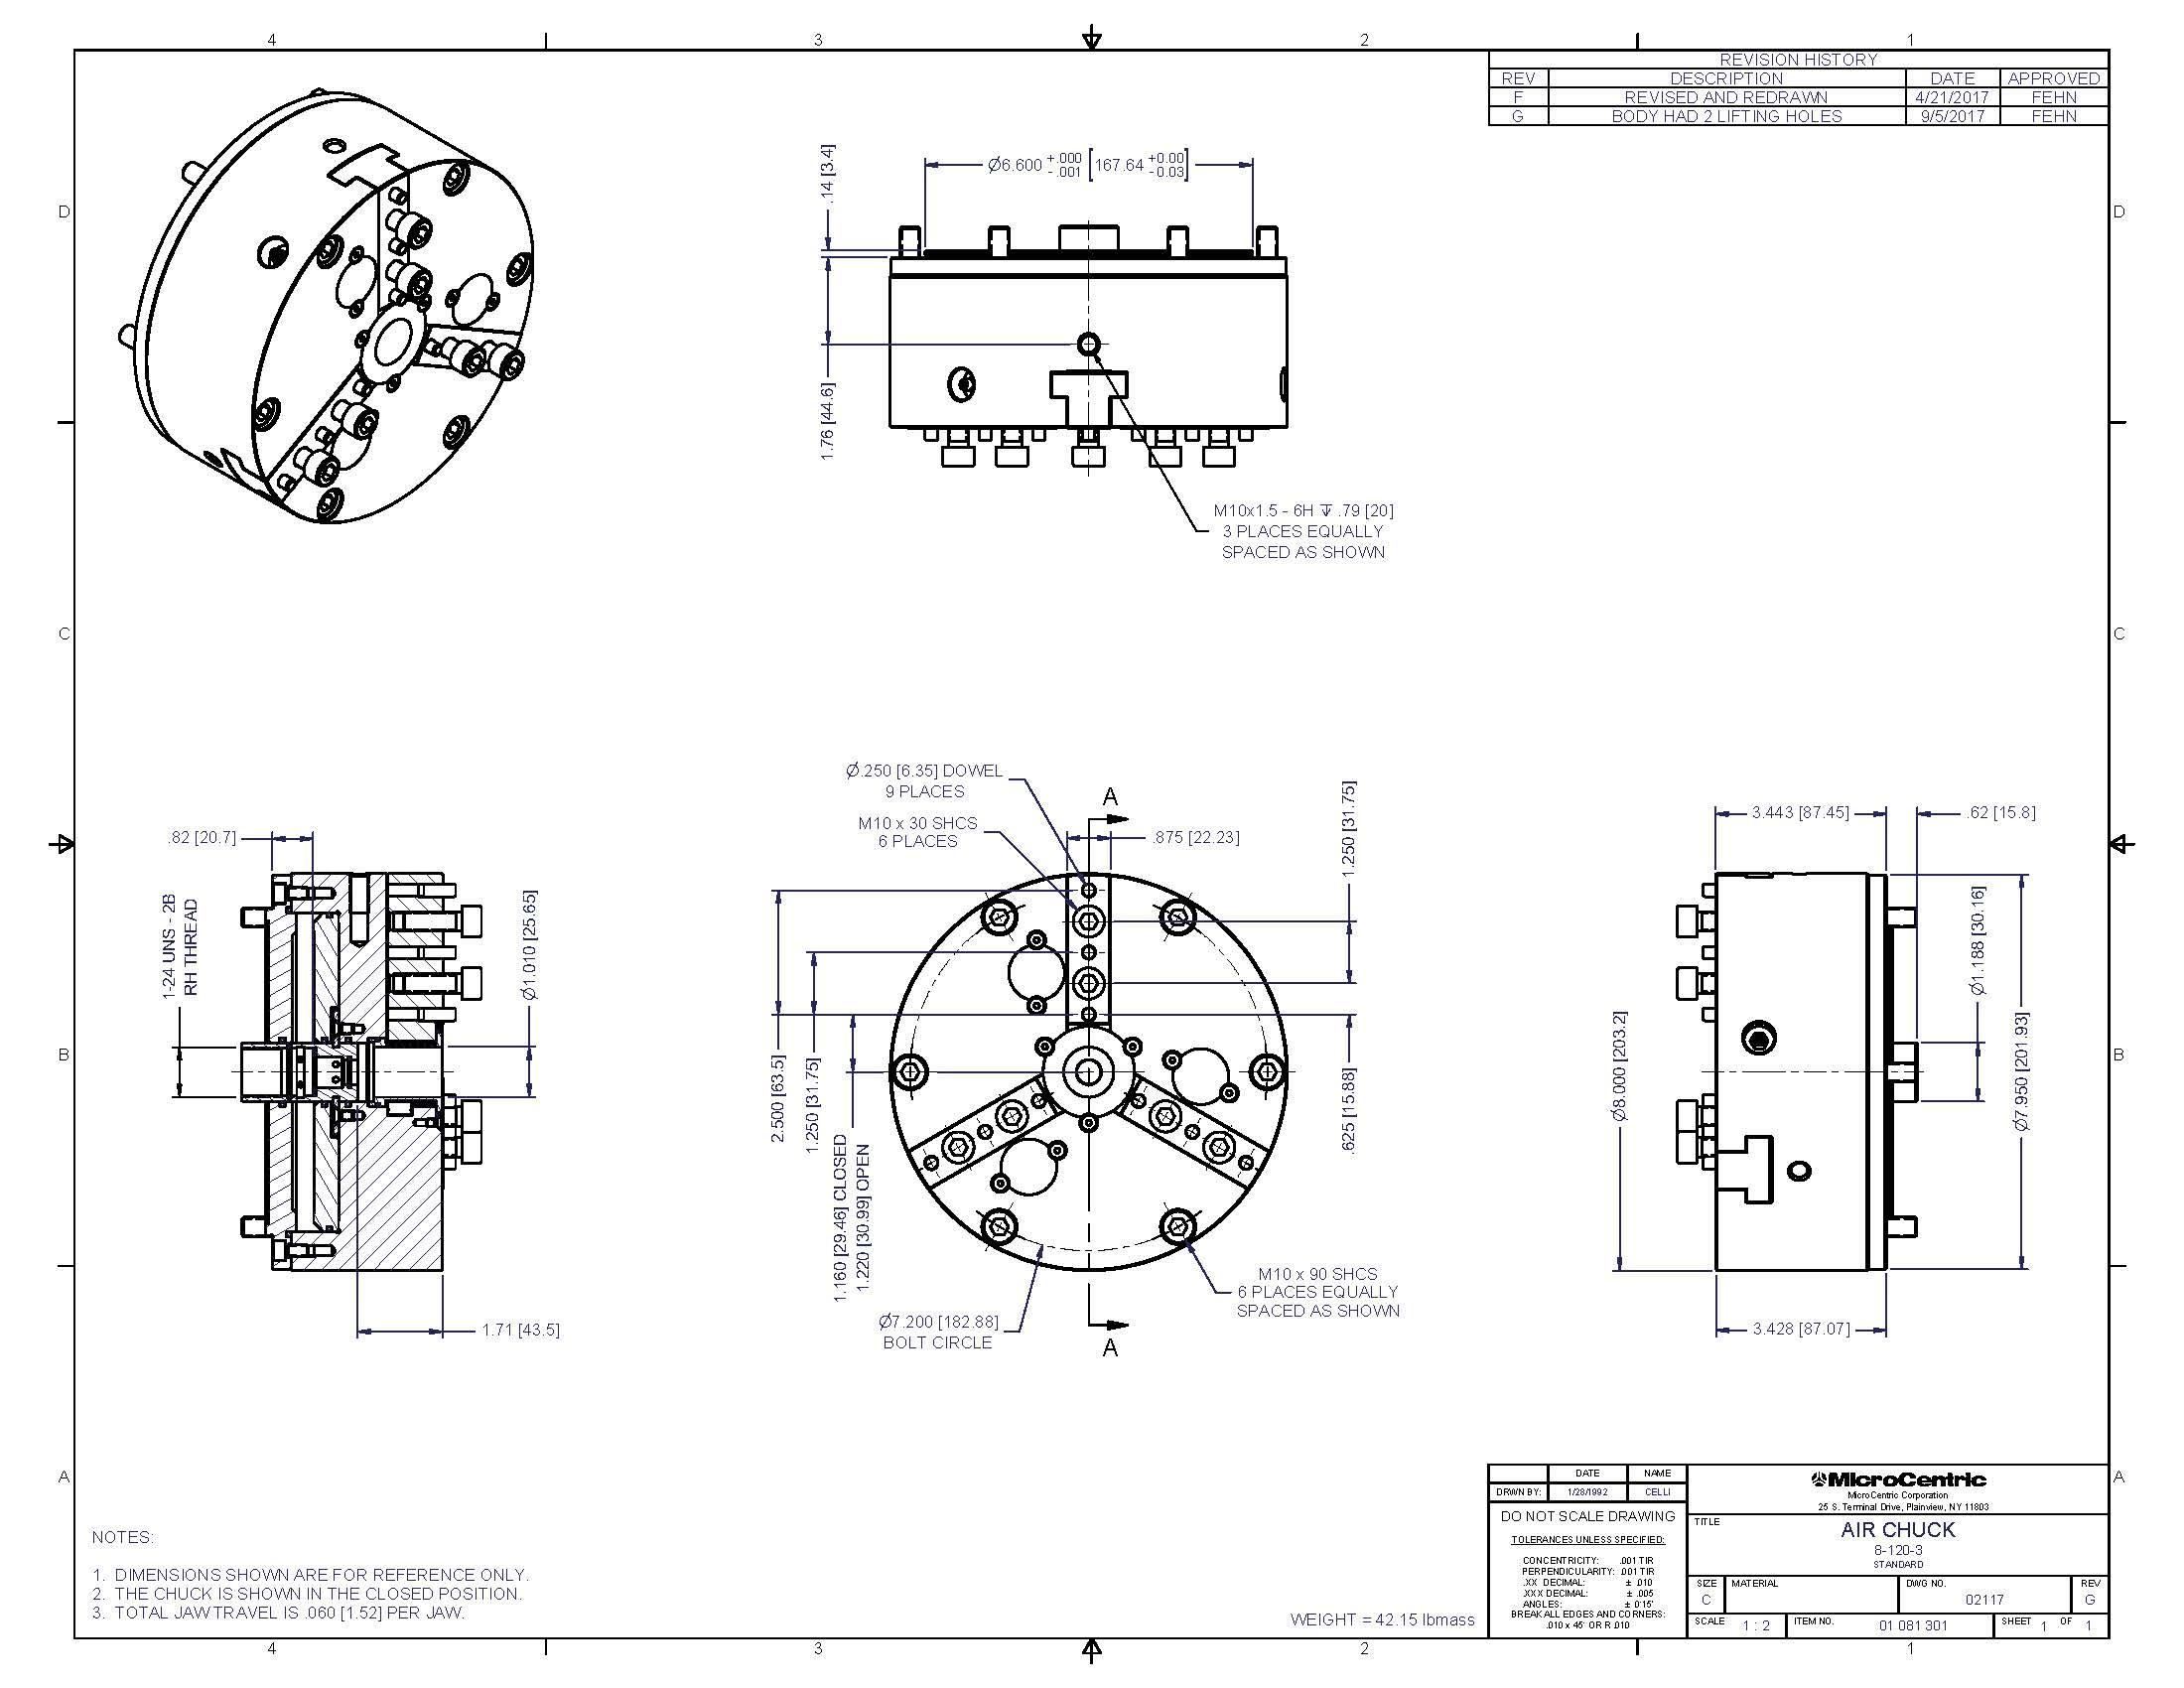 Model 8-120-3, Rotating Air Chucks On MicroCentric Corp.